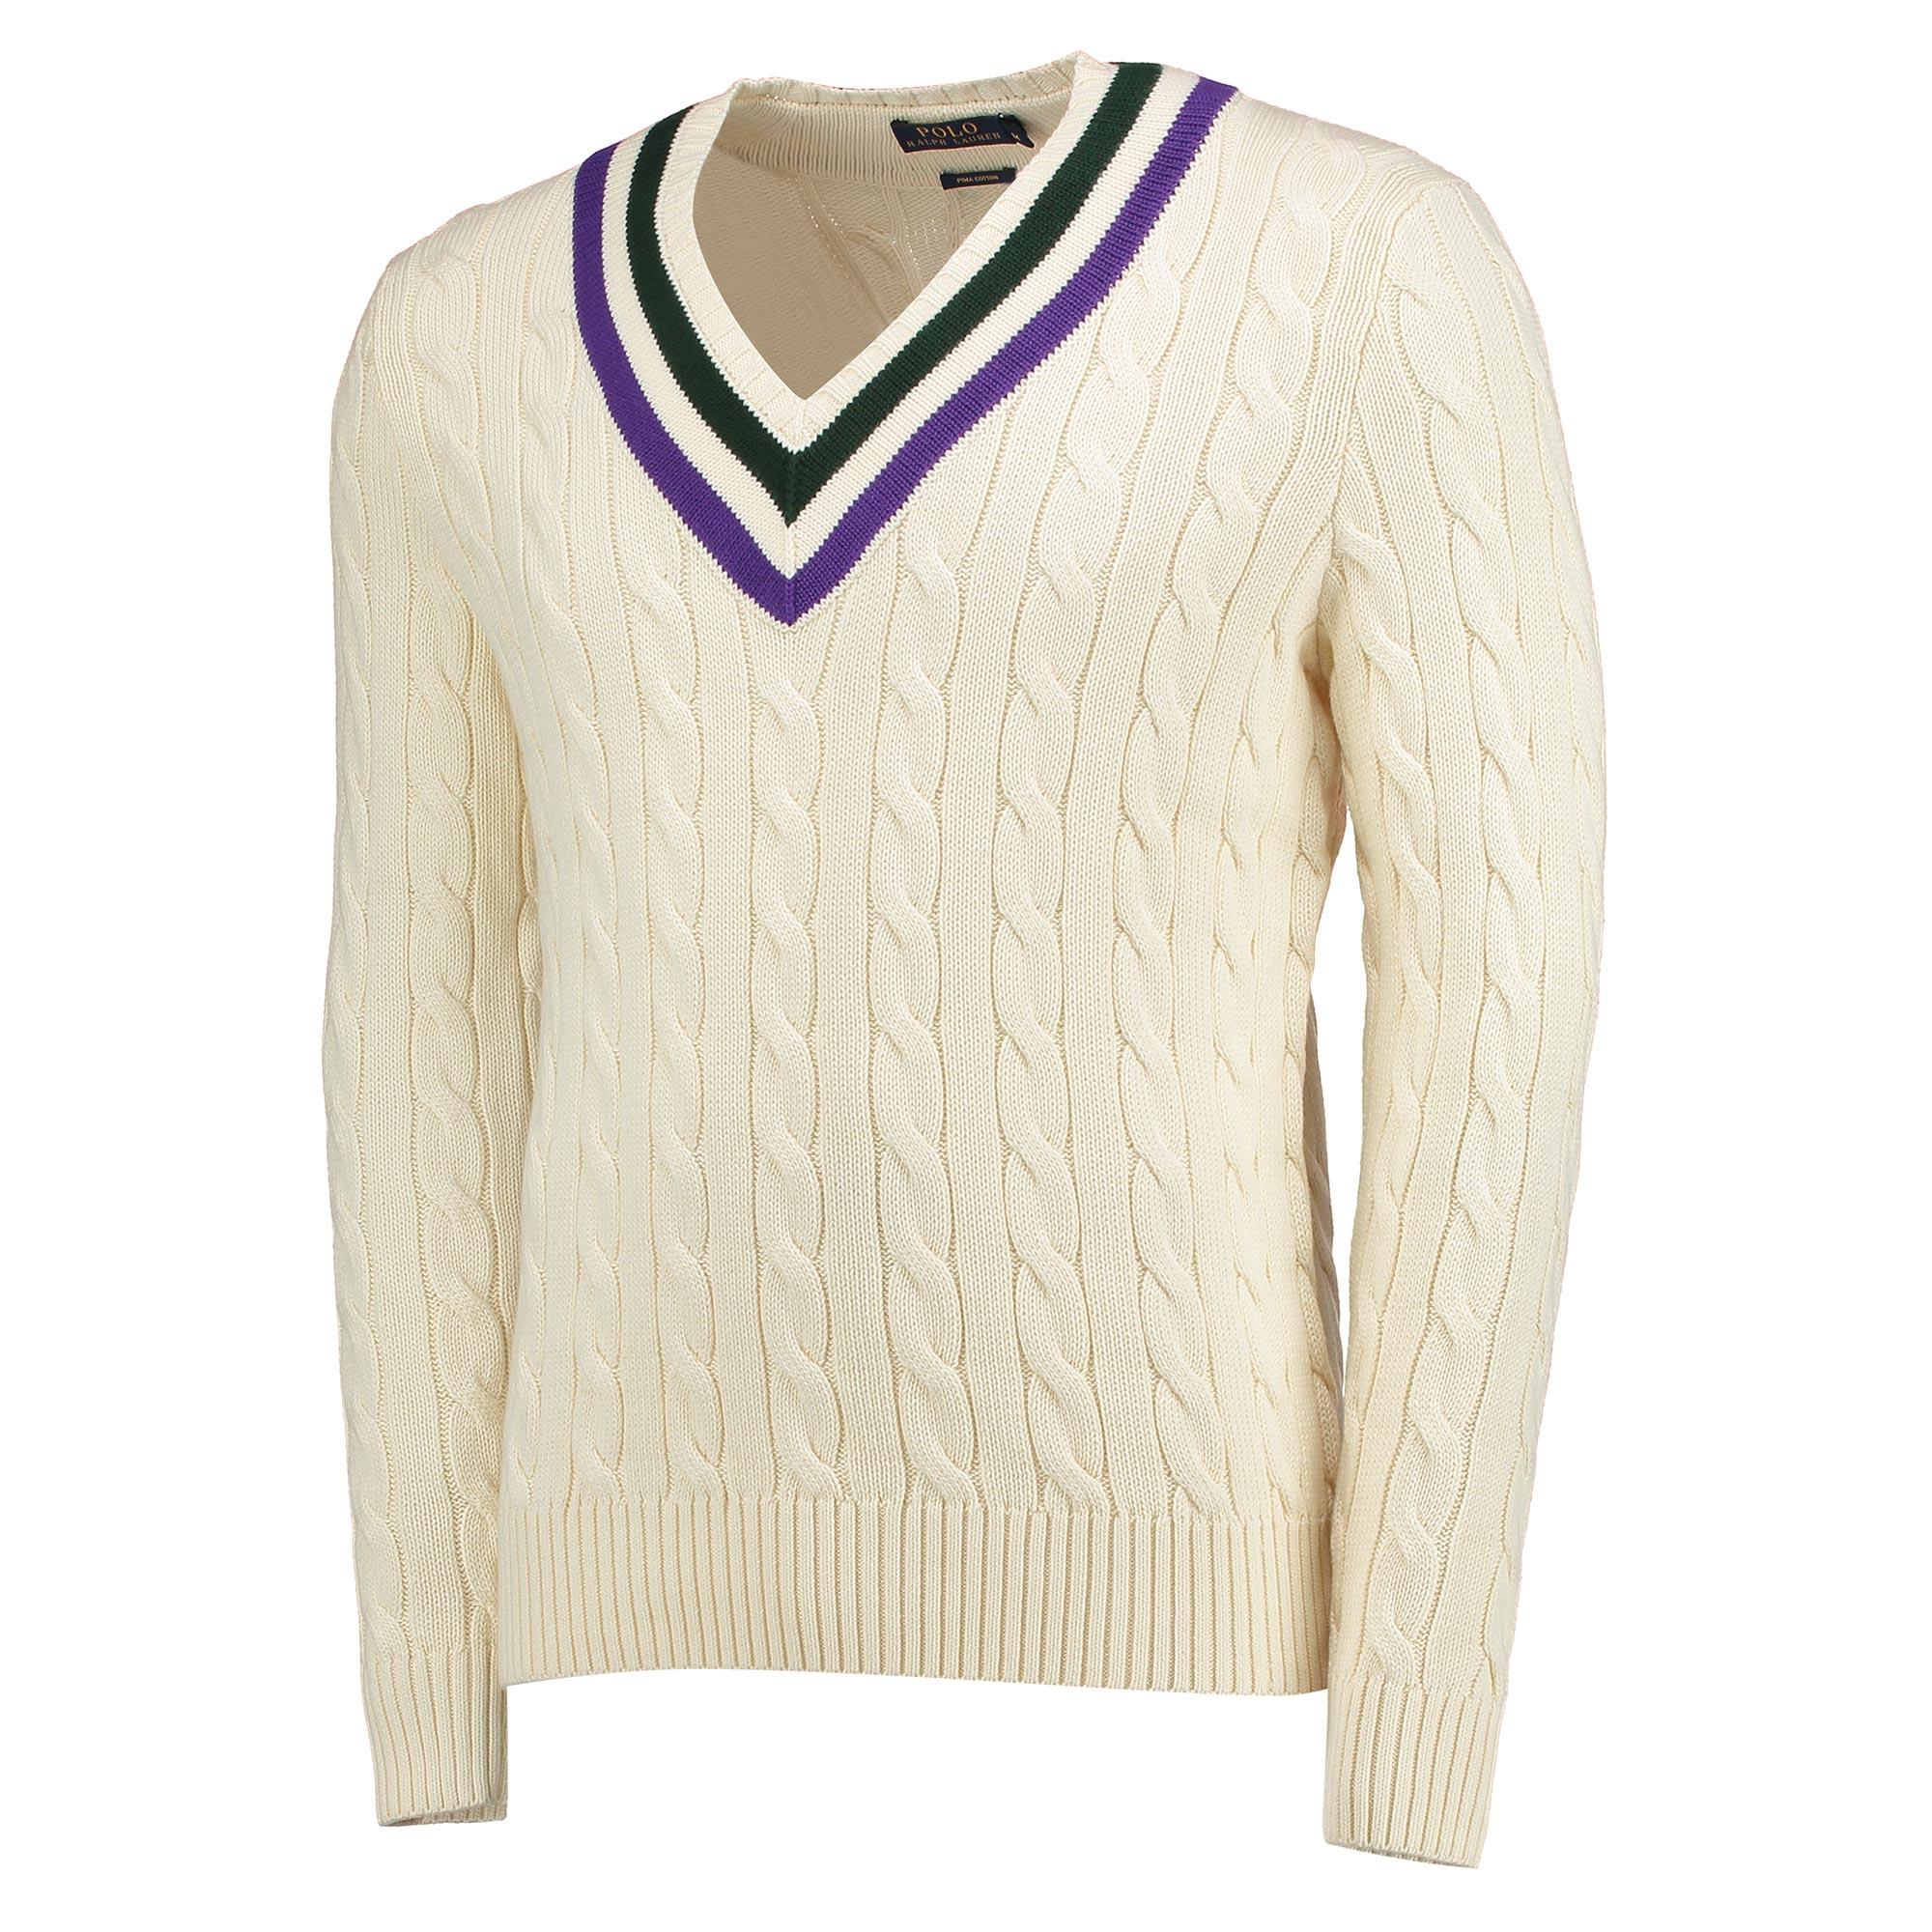 Wimbledon Ralph Lauren L/S V-Neck Sweatshirt - Cricket Cream